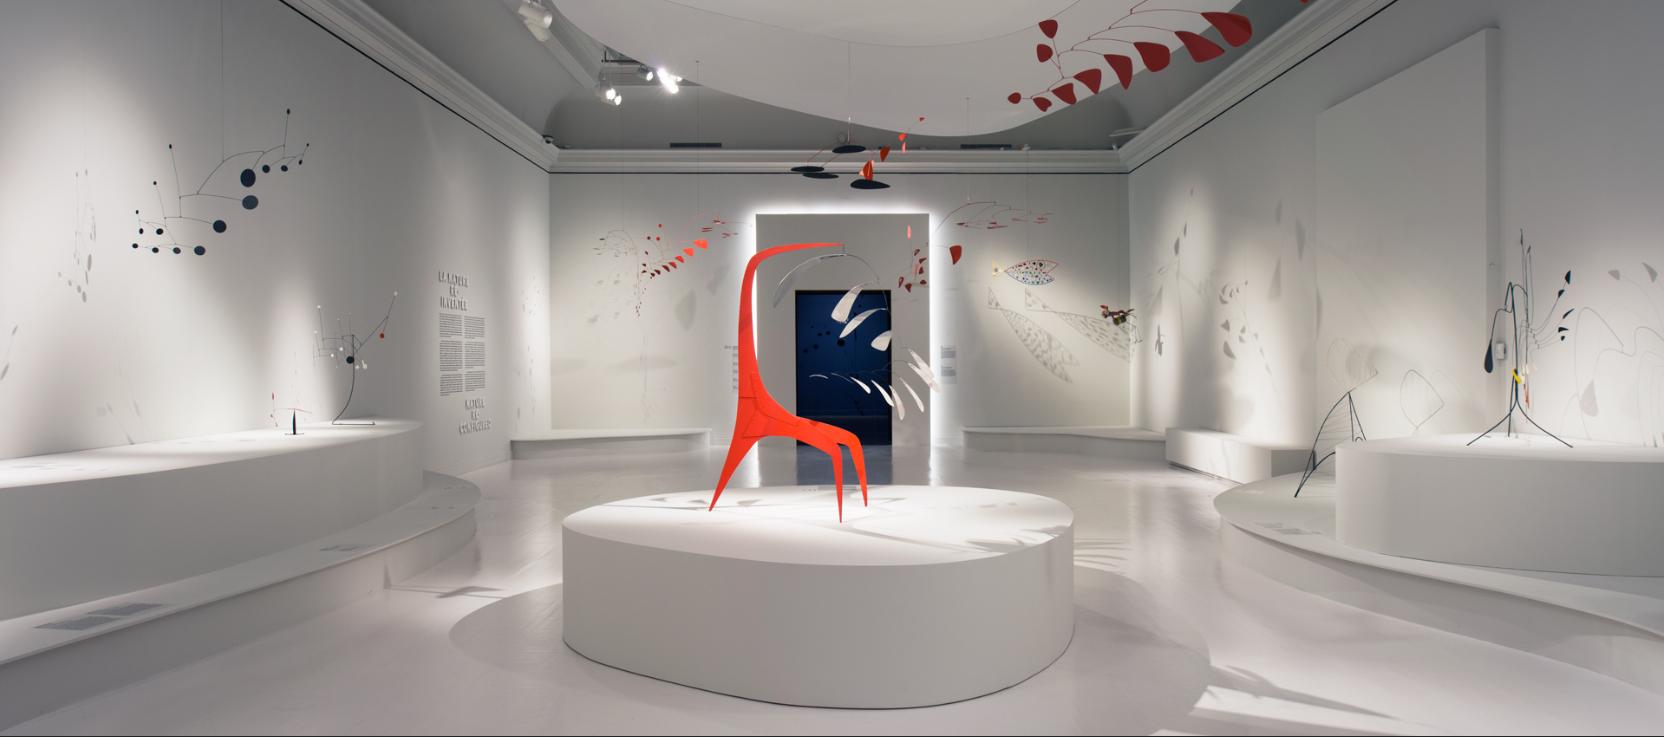 Mostra di Alexander Calder al Mbam di Montreal